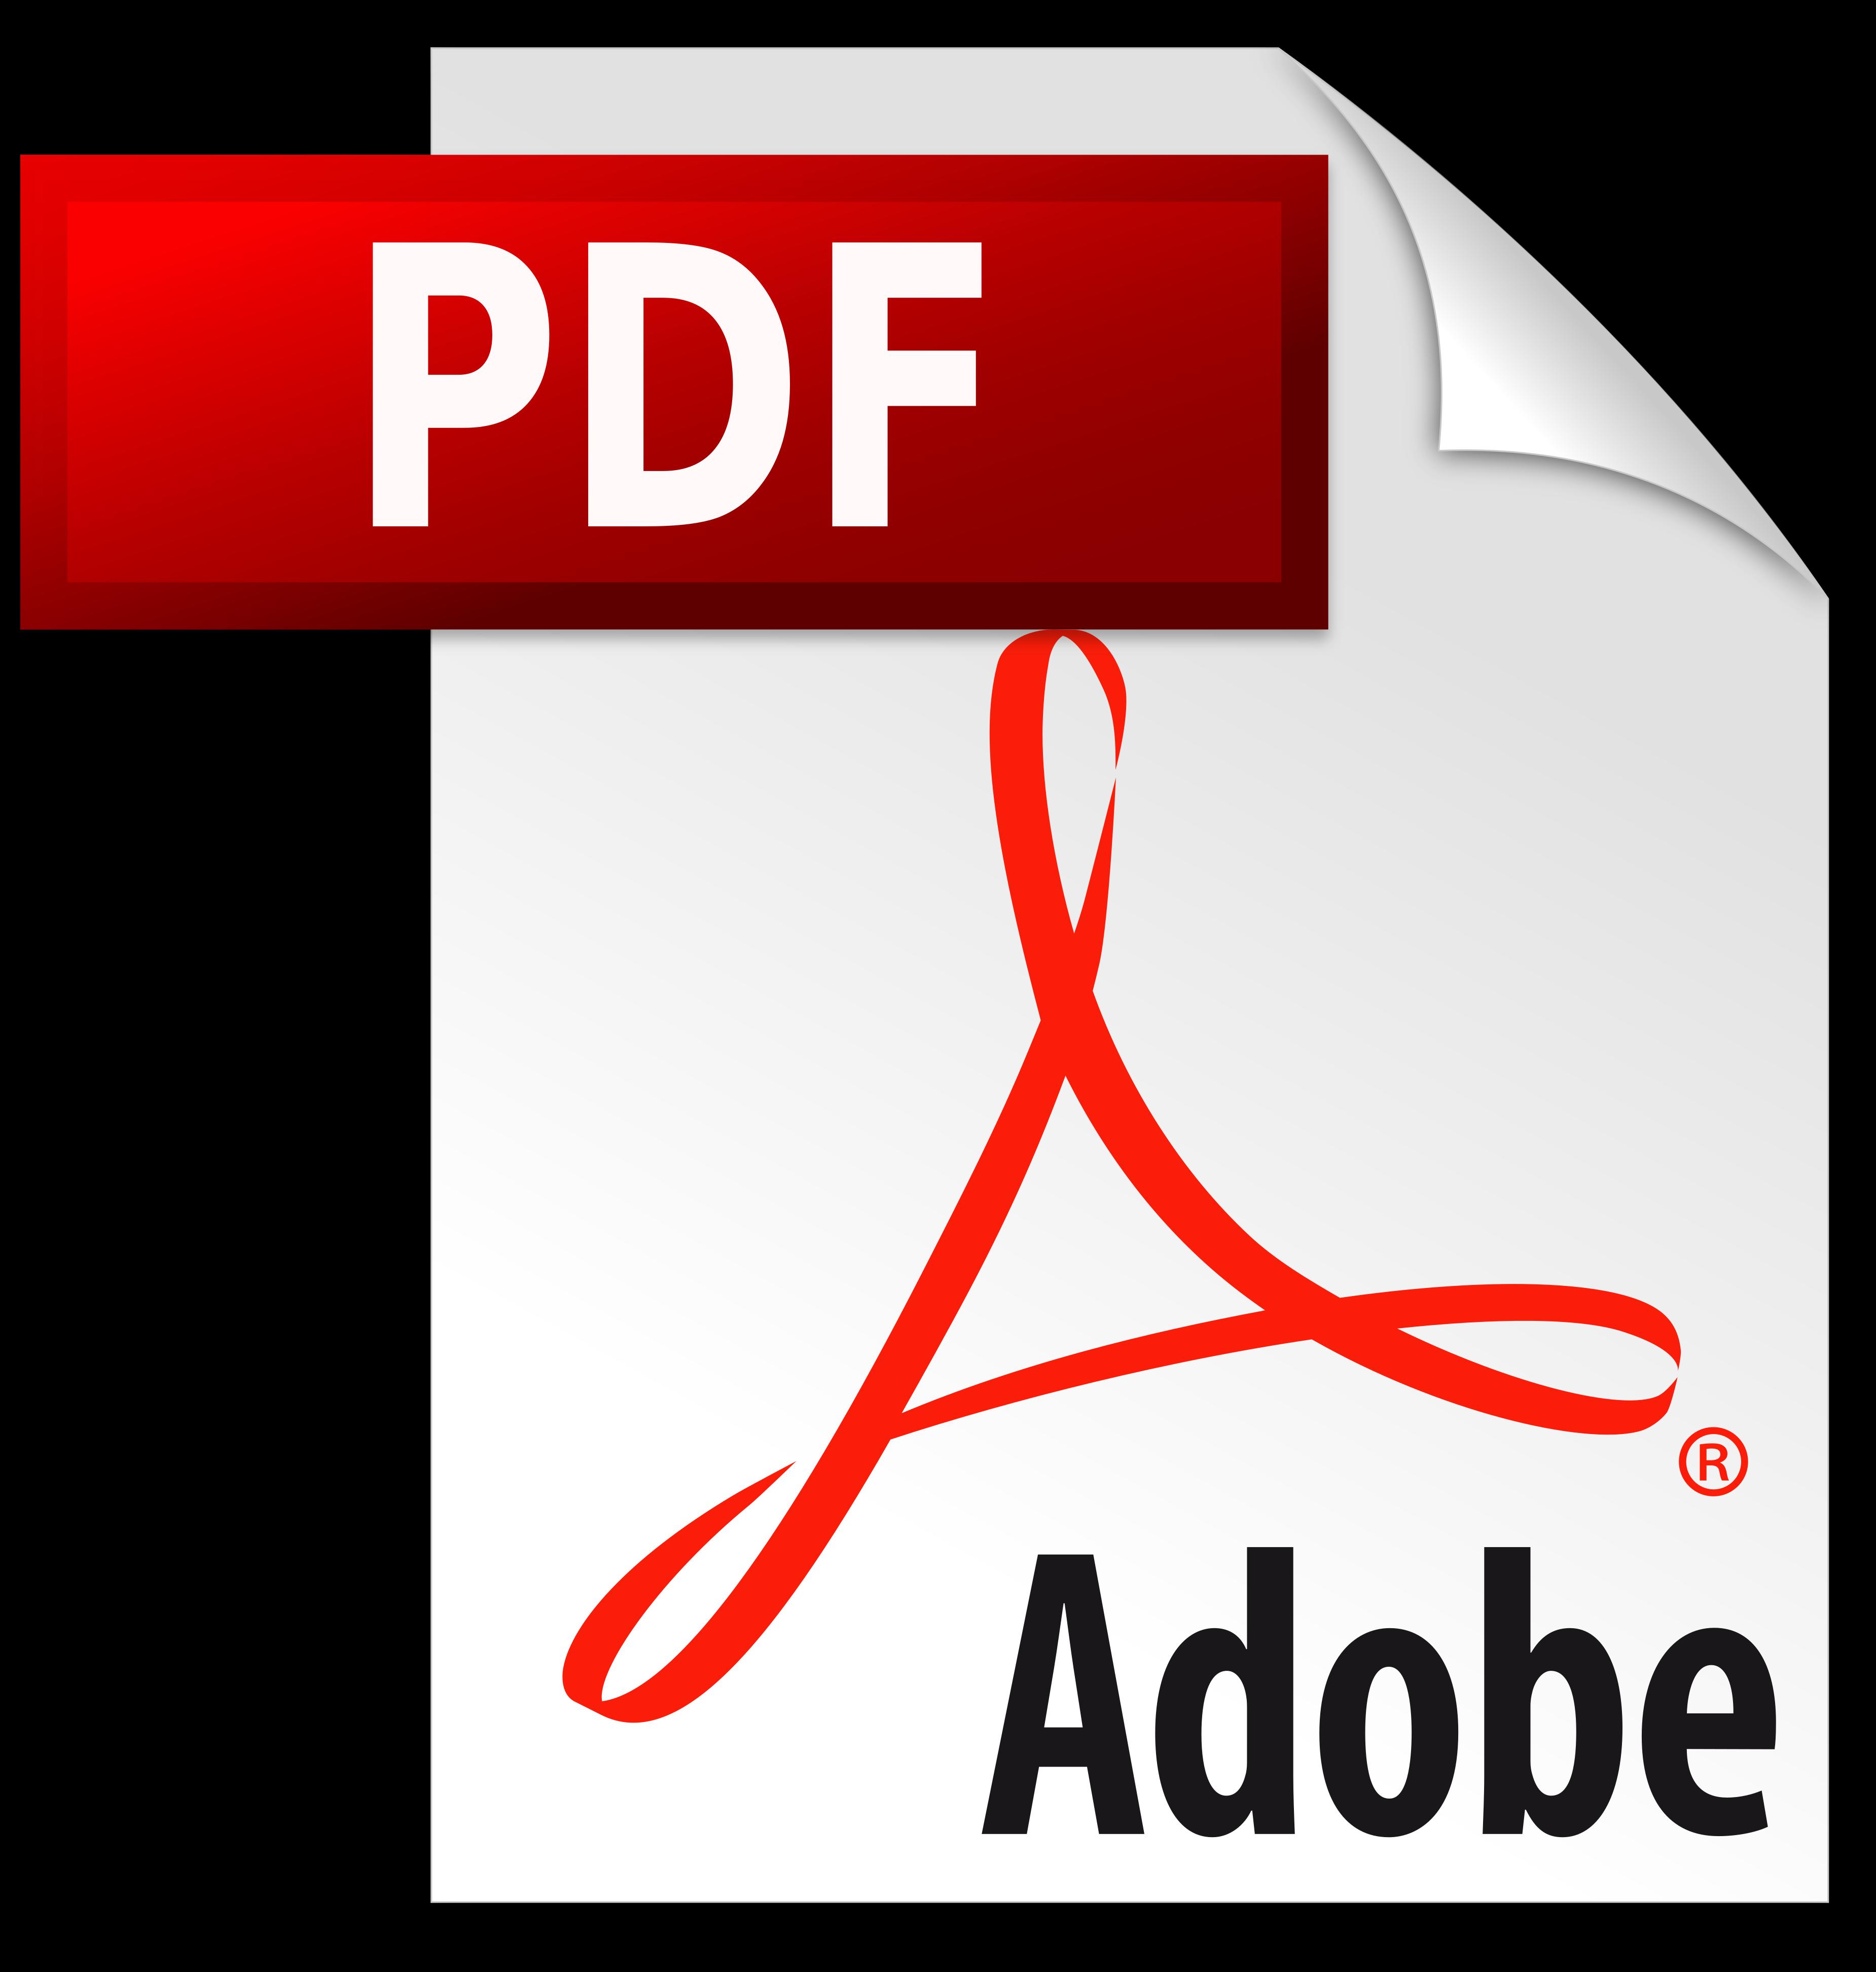 Adobe pdf icone.